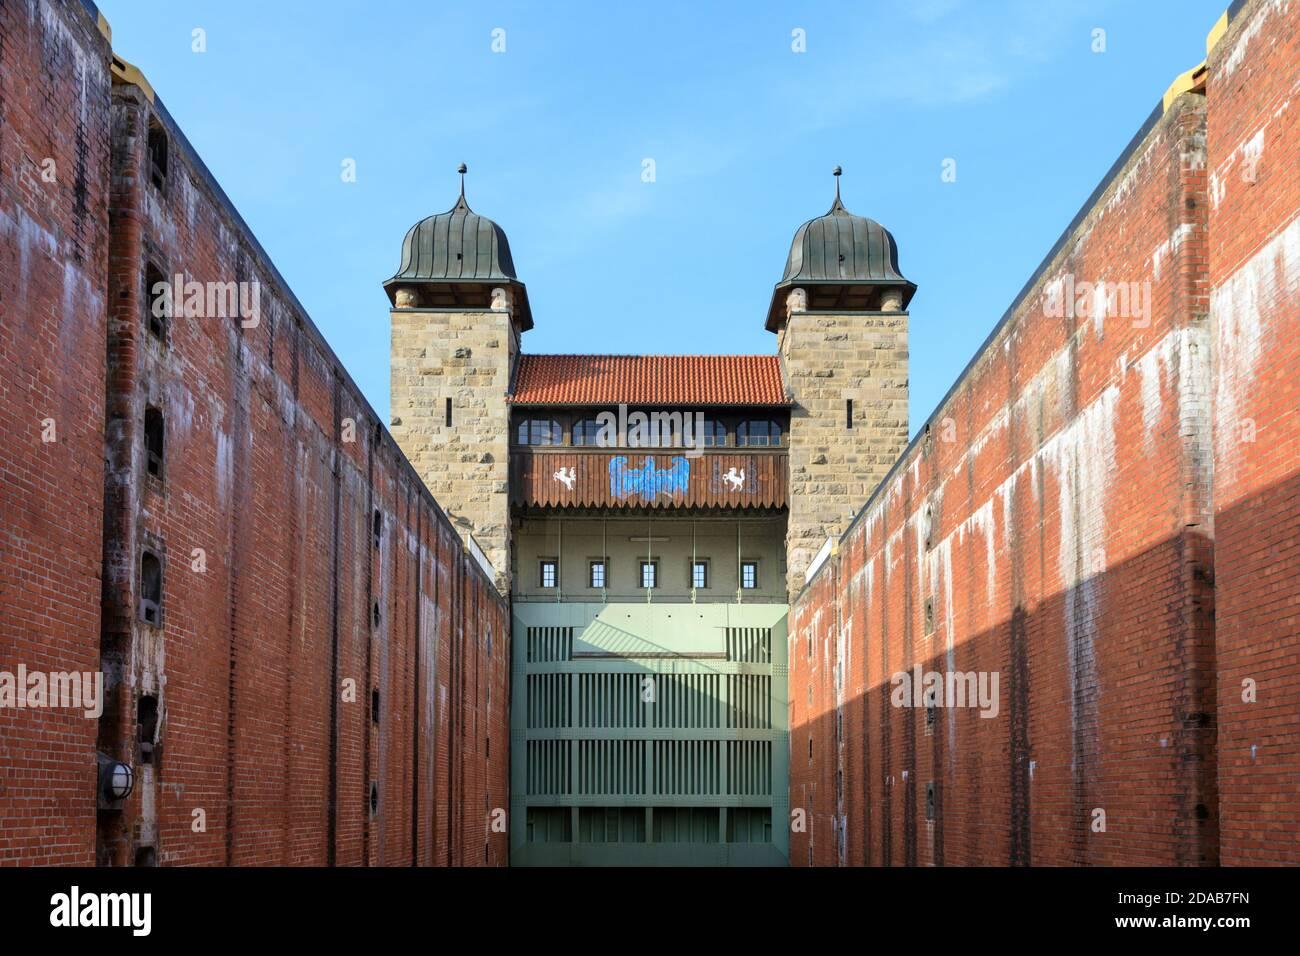 Old shaft lock, part pf Henrichenburg boat lift, Industrial Heritage site by Dortmund Ems Canal, North Rhine-Westphalia, Germany Stock Photo